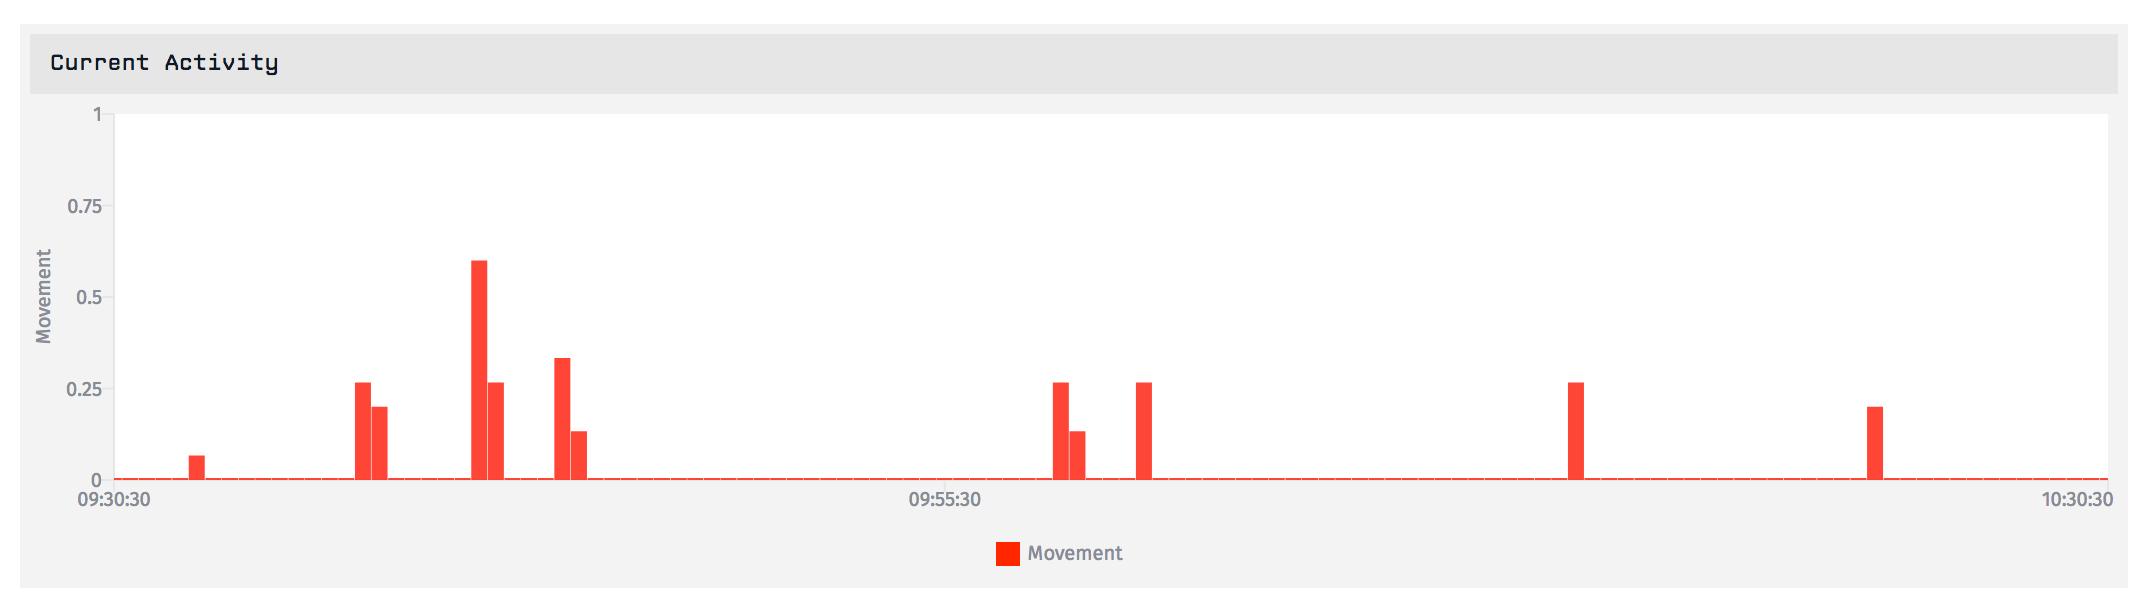 losant-iot-dashboard-visualization.png